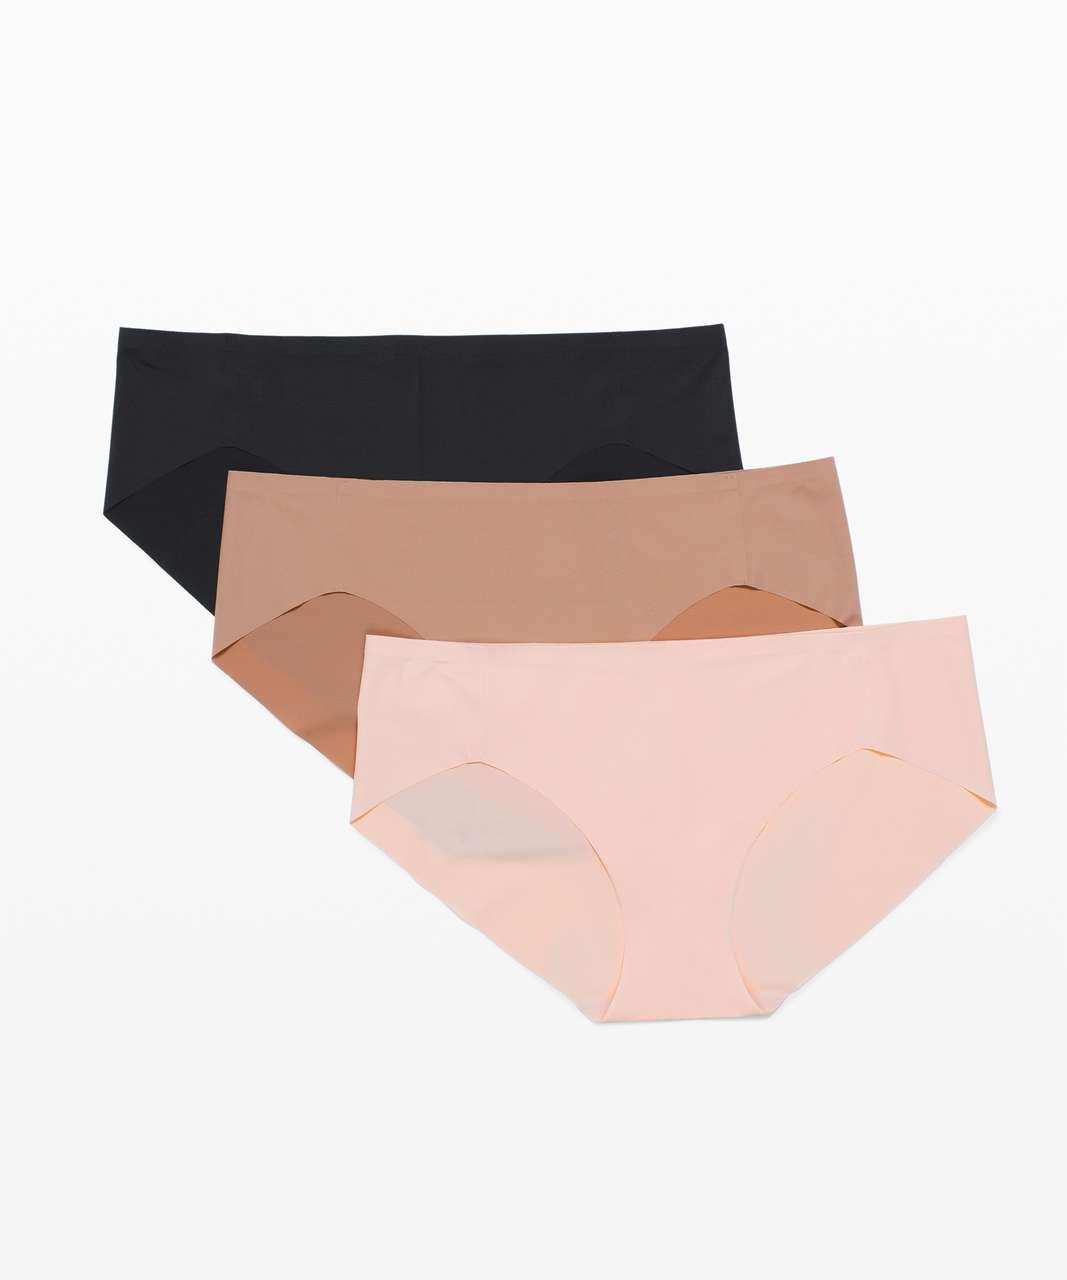 Lululemon Smooth Seamless Hipster 3 Pack - Black / Misty Shell / Soft Sand